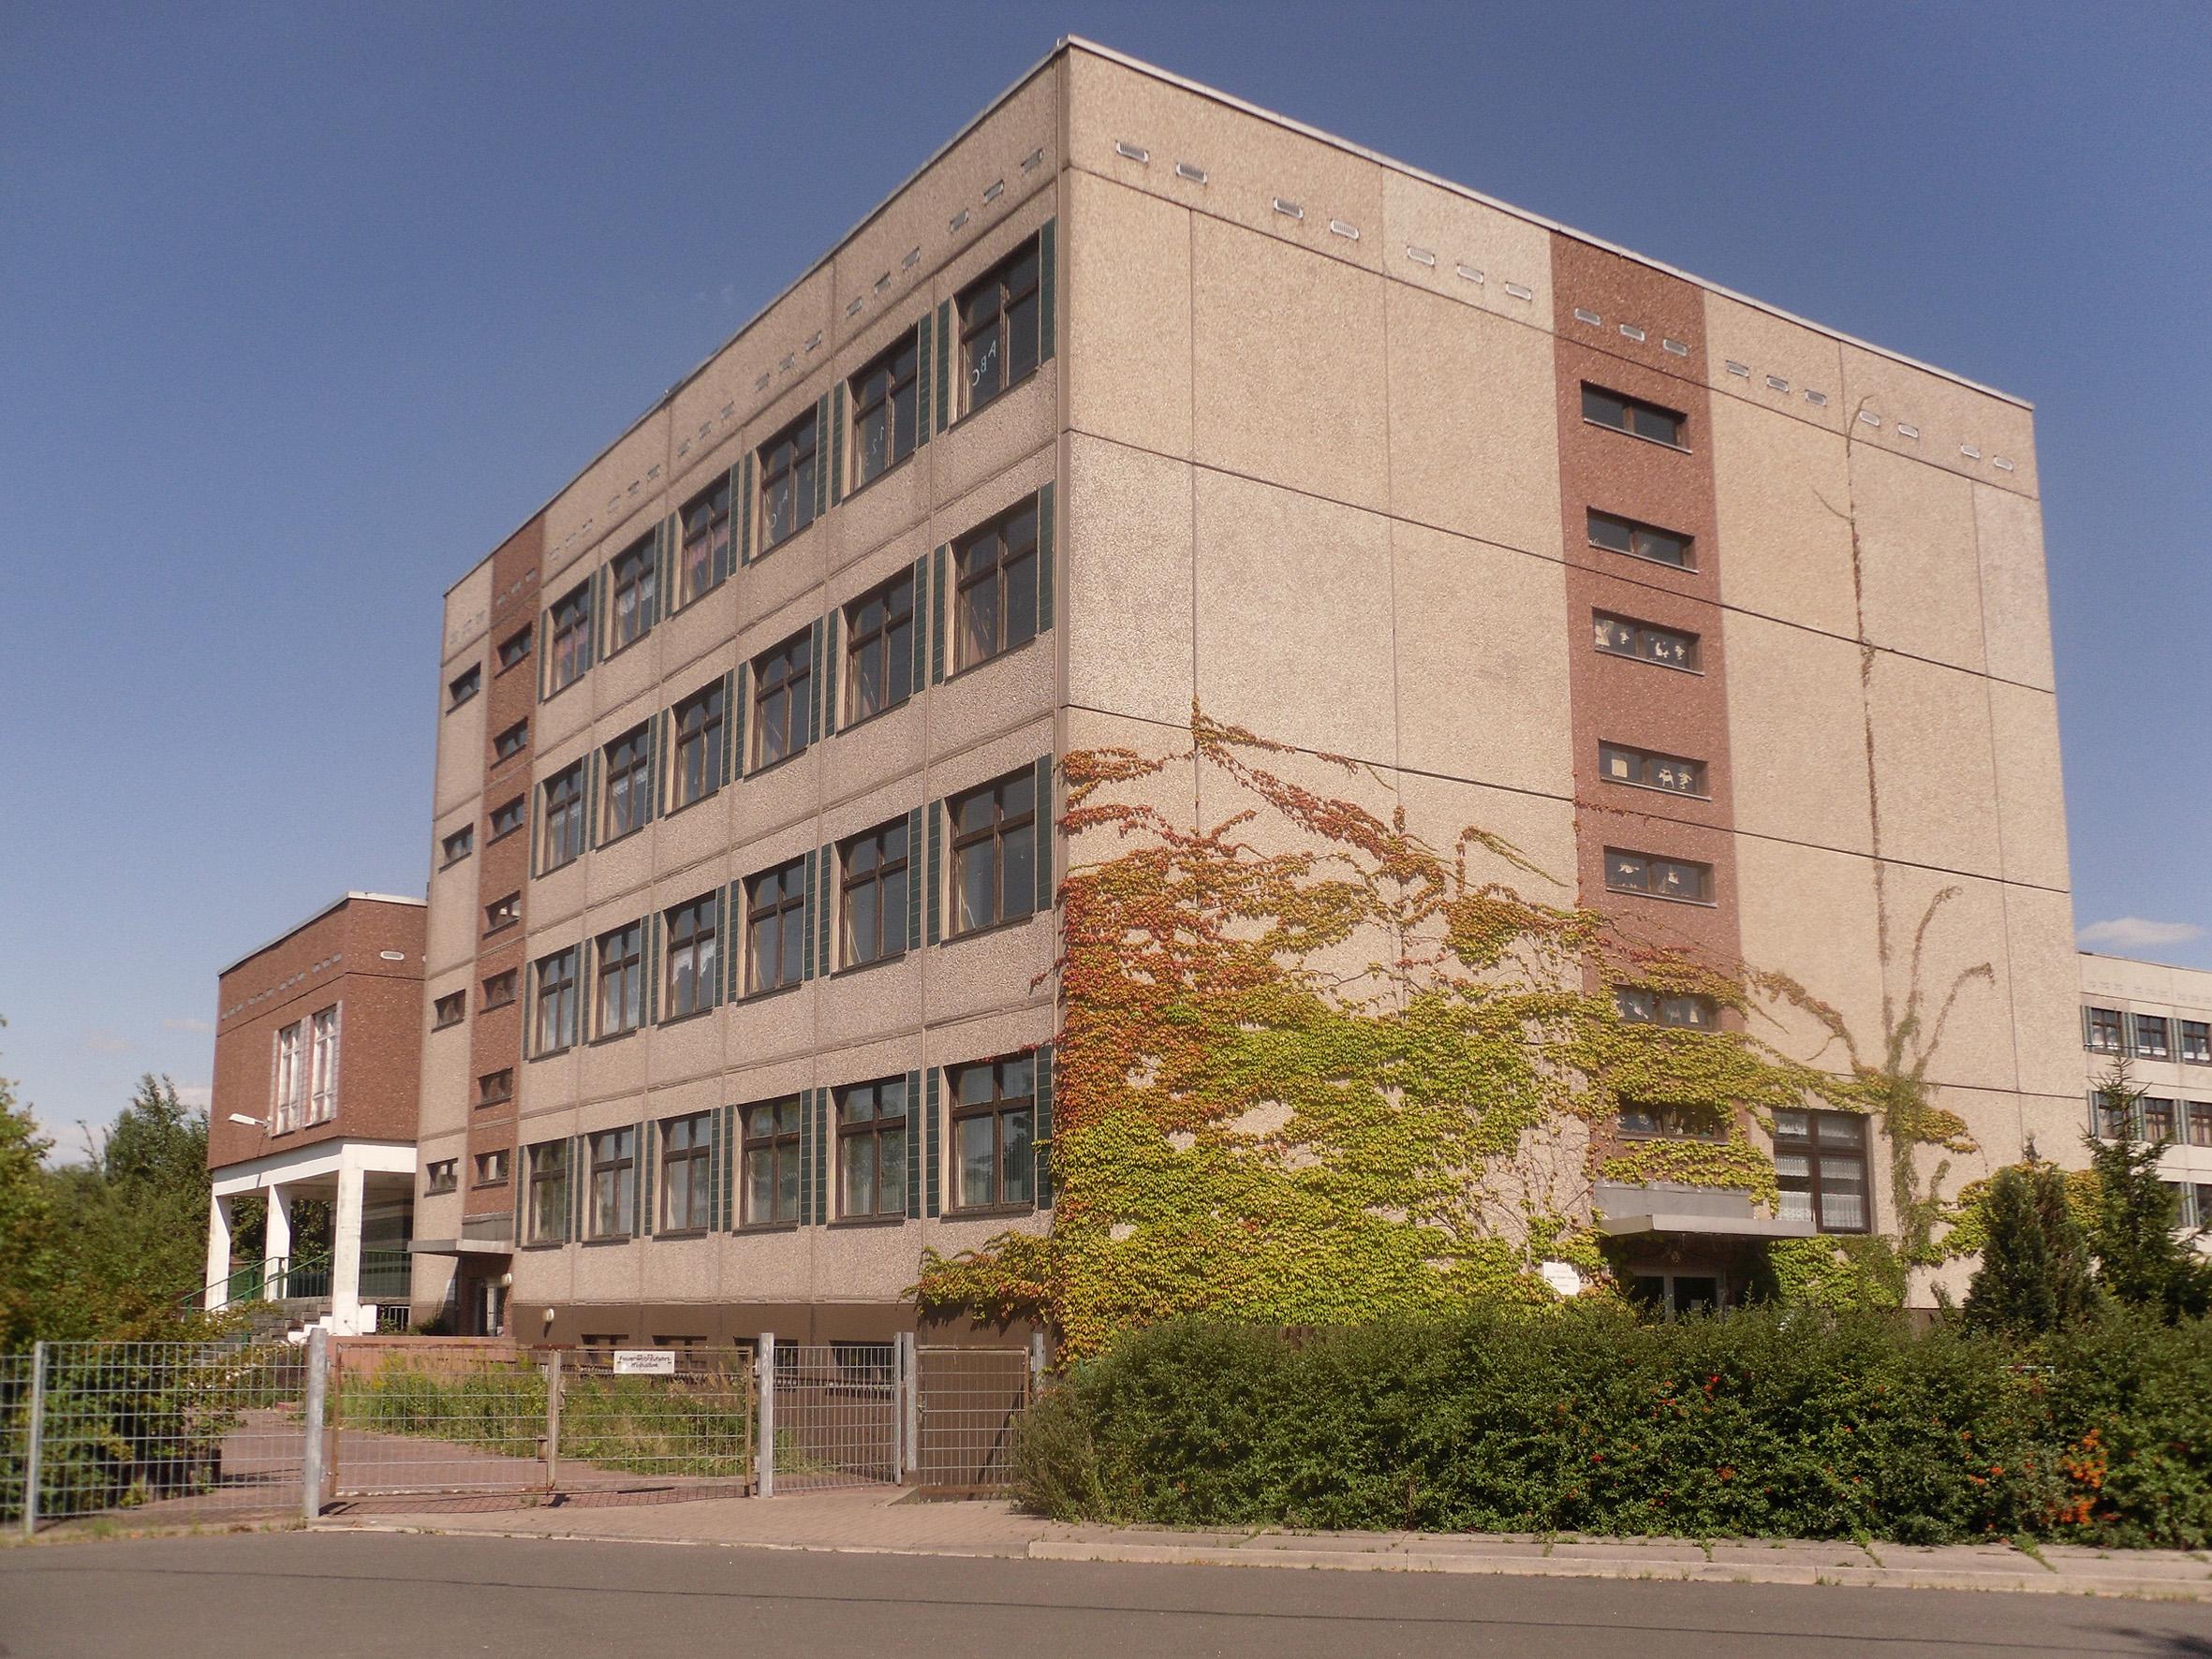 Brüder Grimm Schule Leipzig